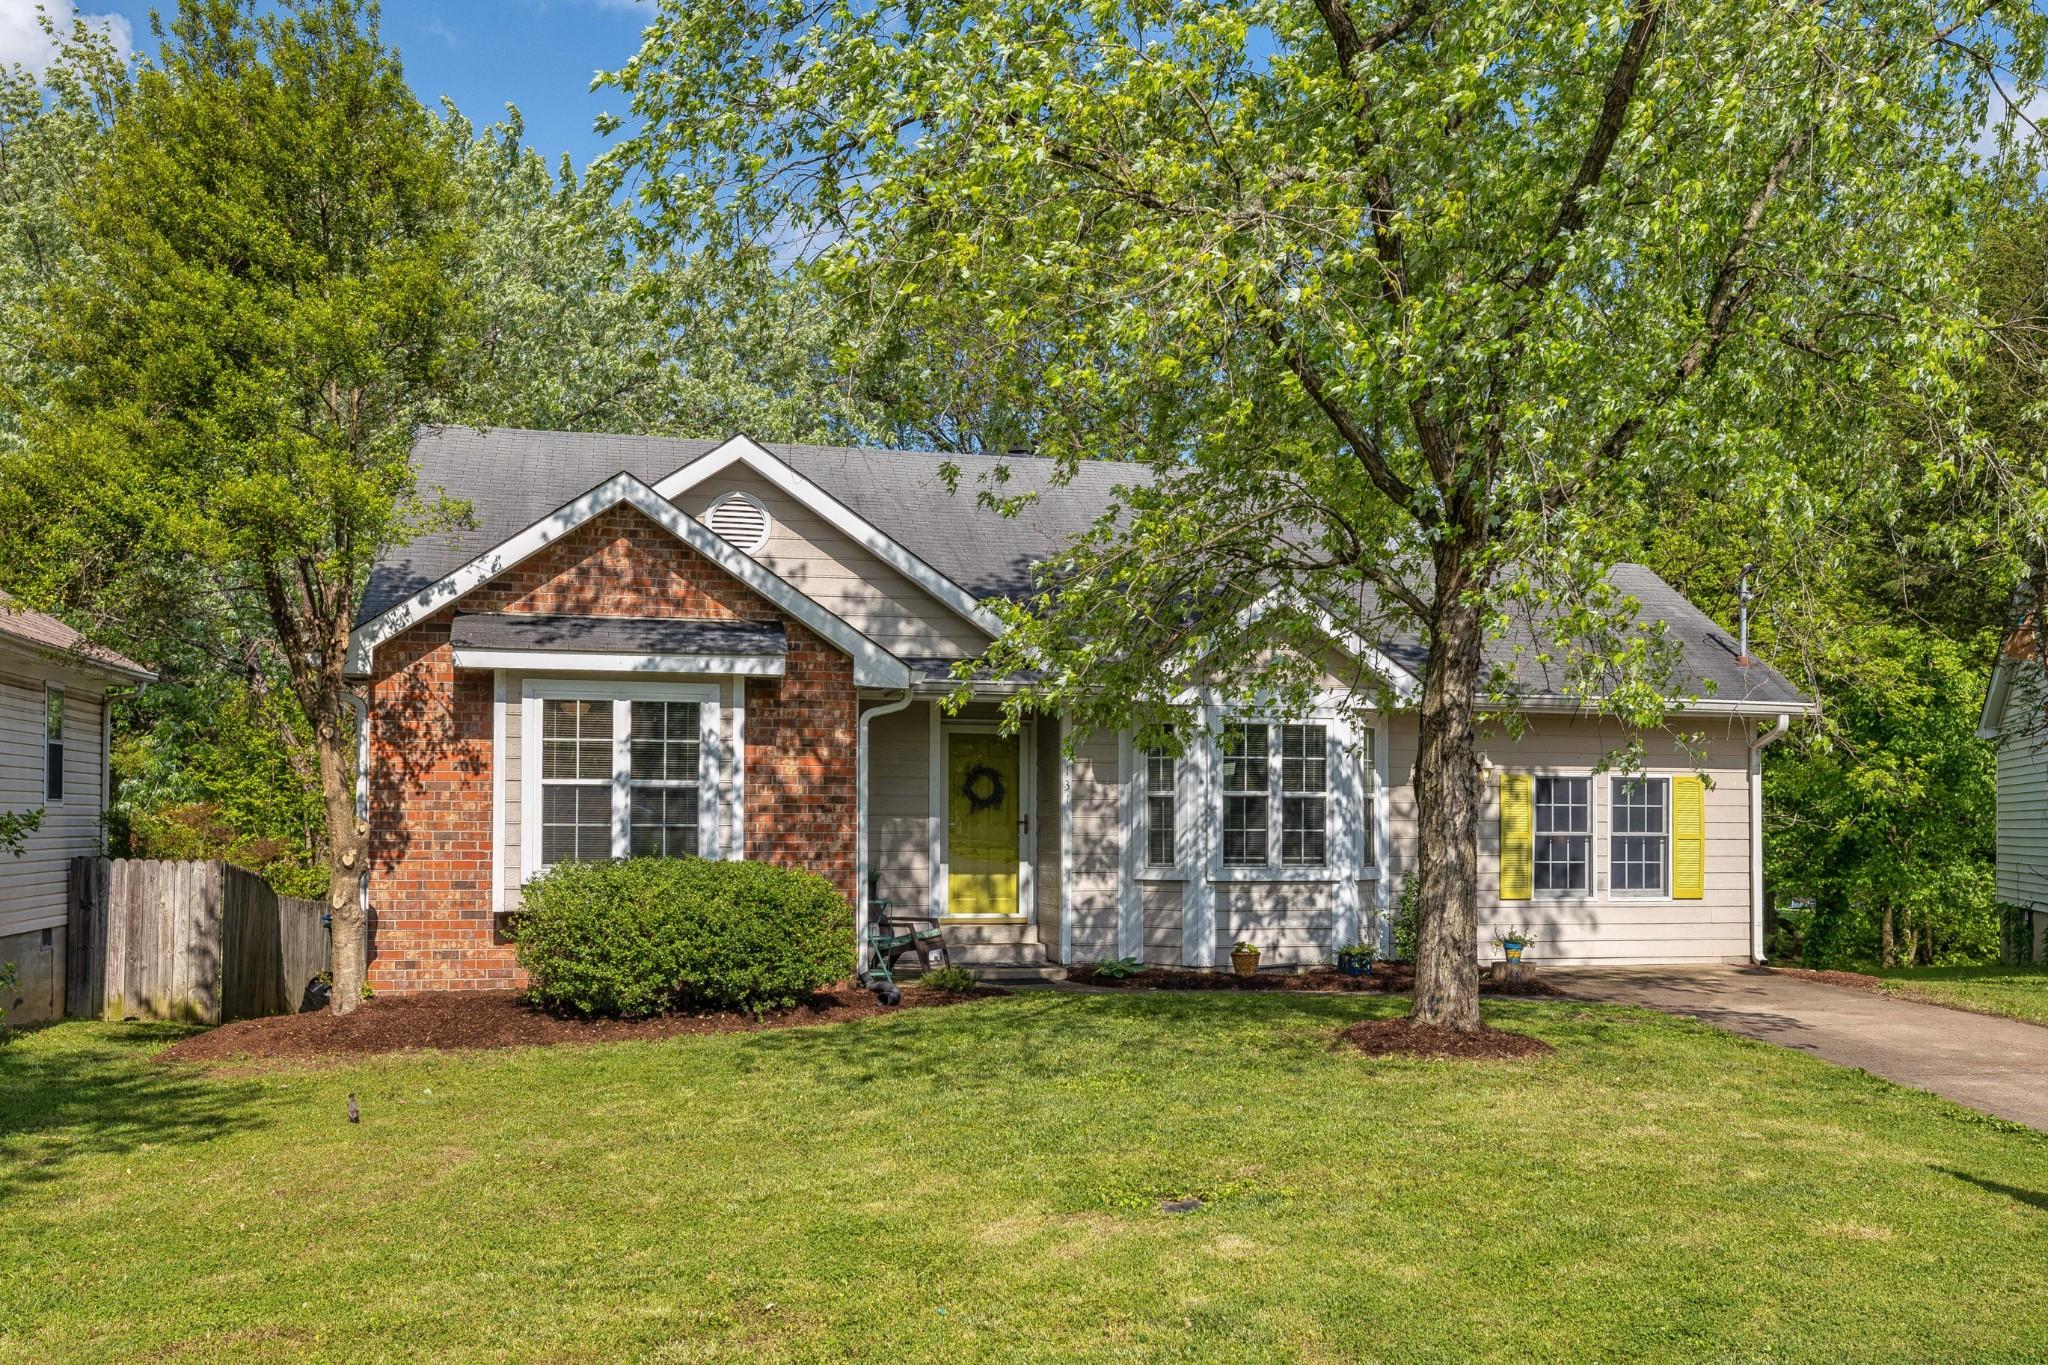 131 Agee Cir E Property Photo - Hendersonville, TN real estate listing